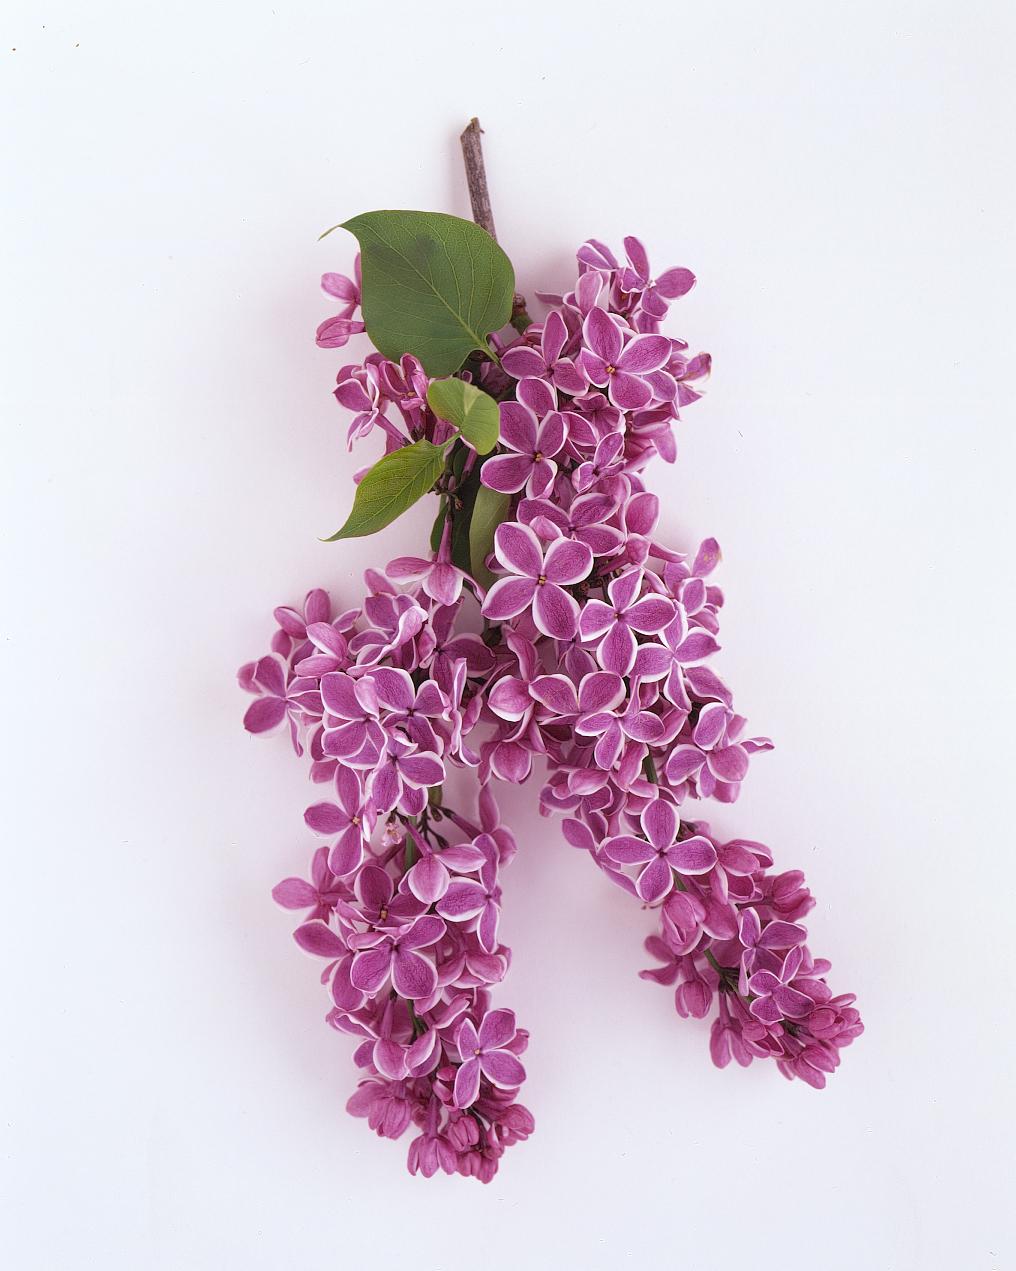 flower-glossary-lilac-purple-a9843204-0415.jpg